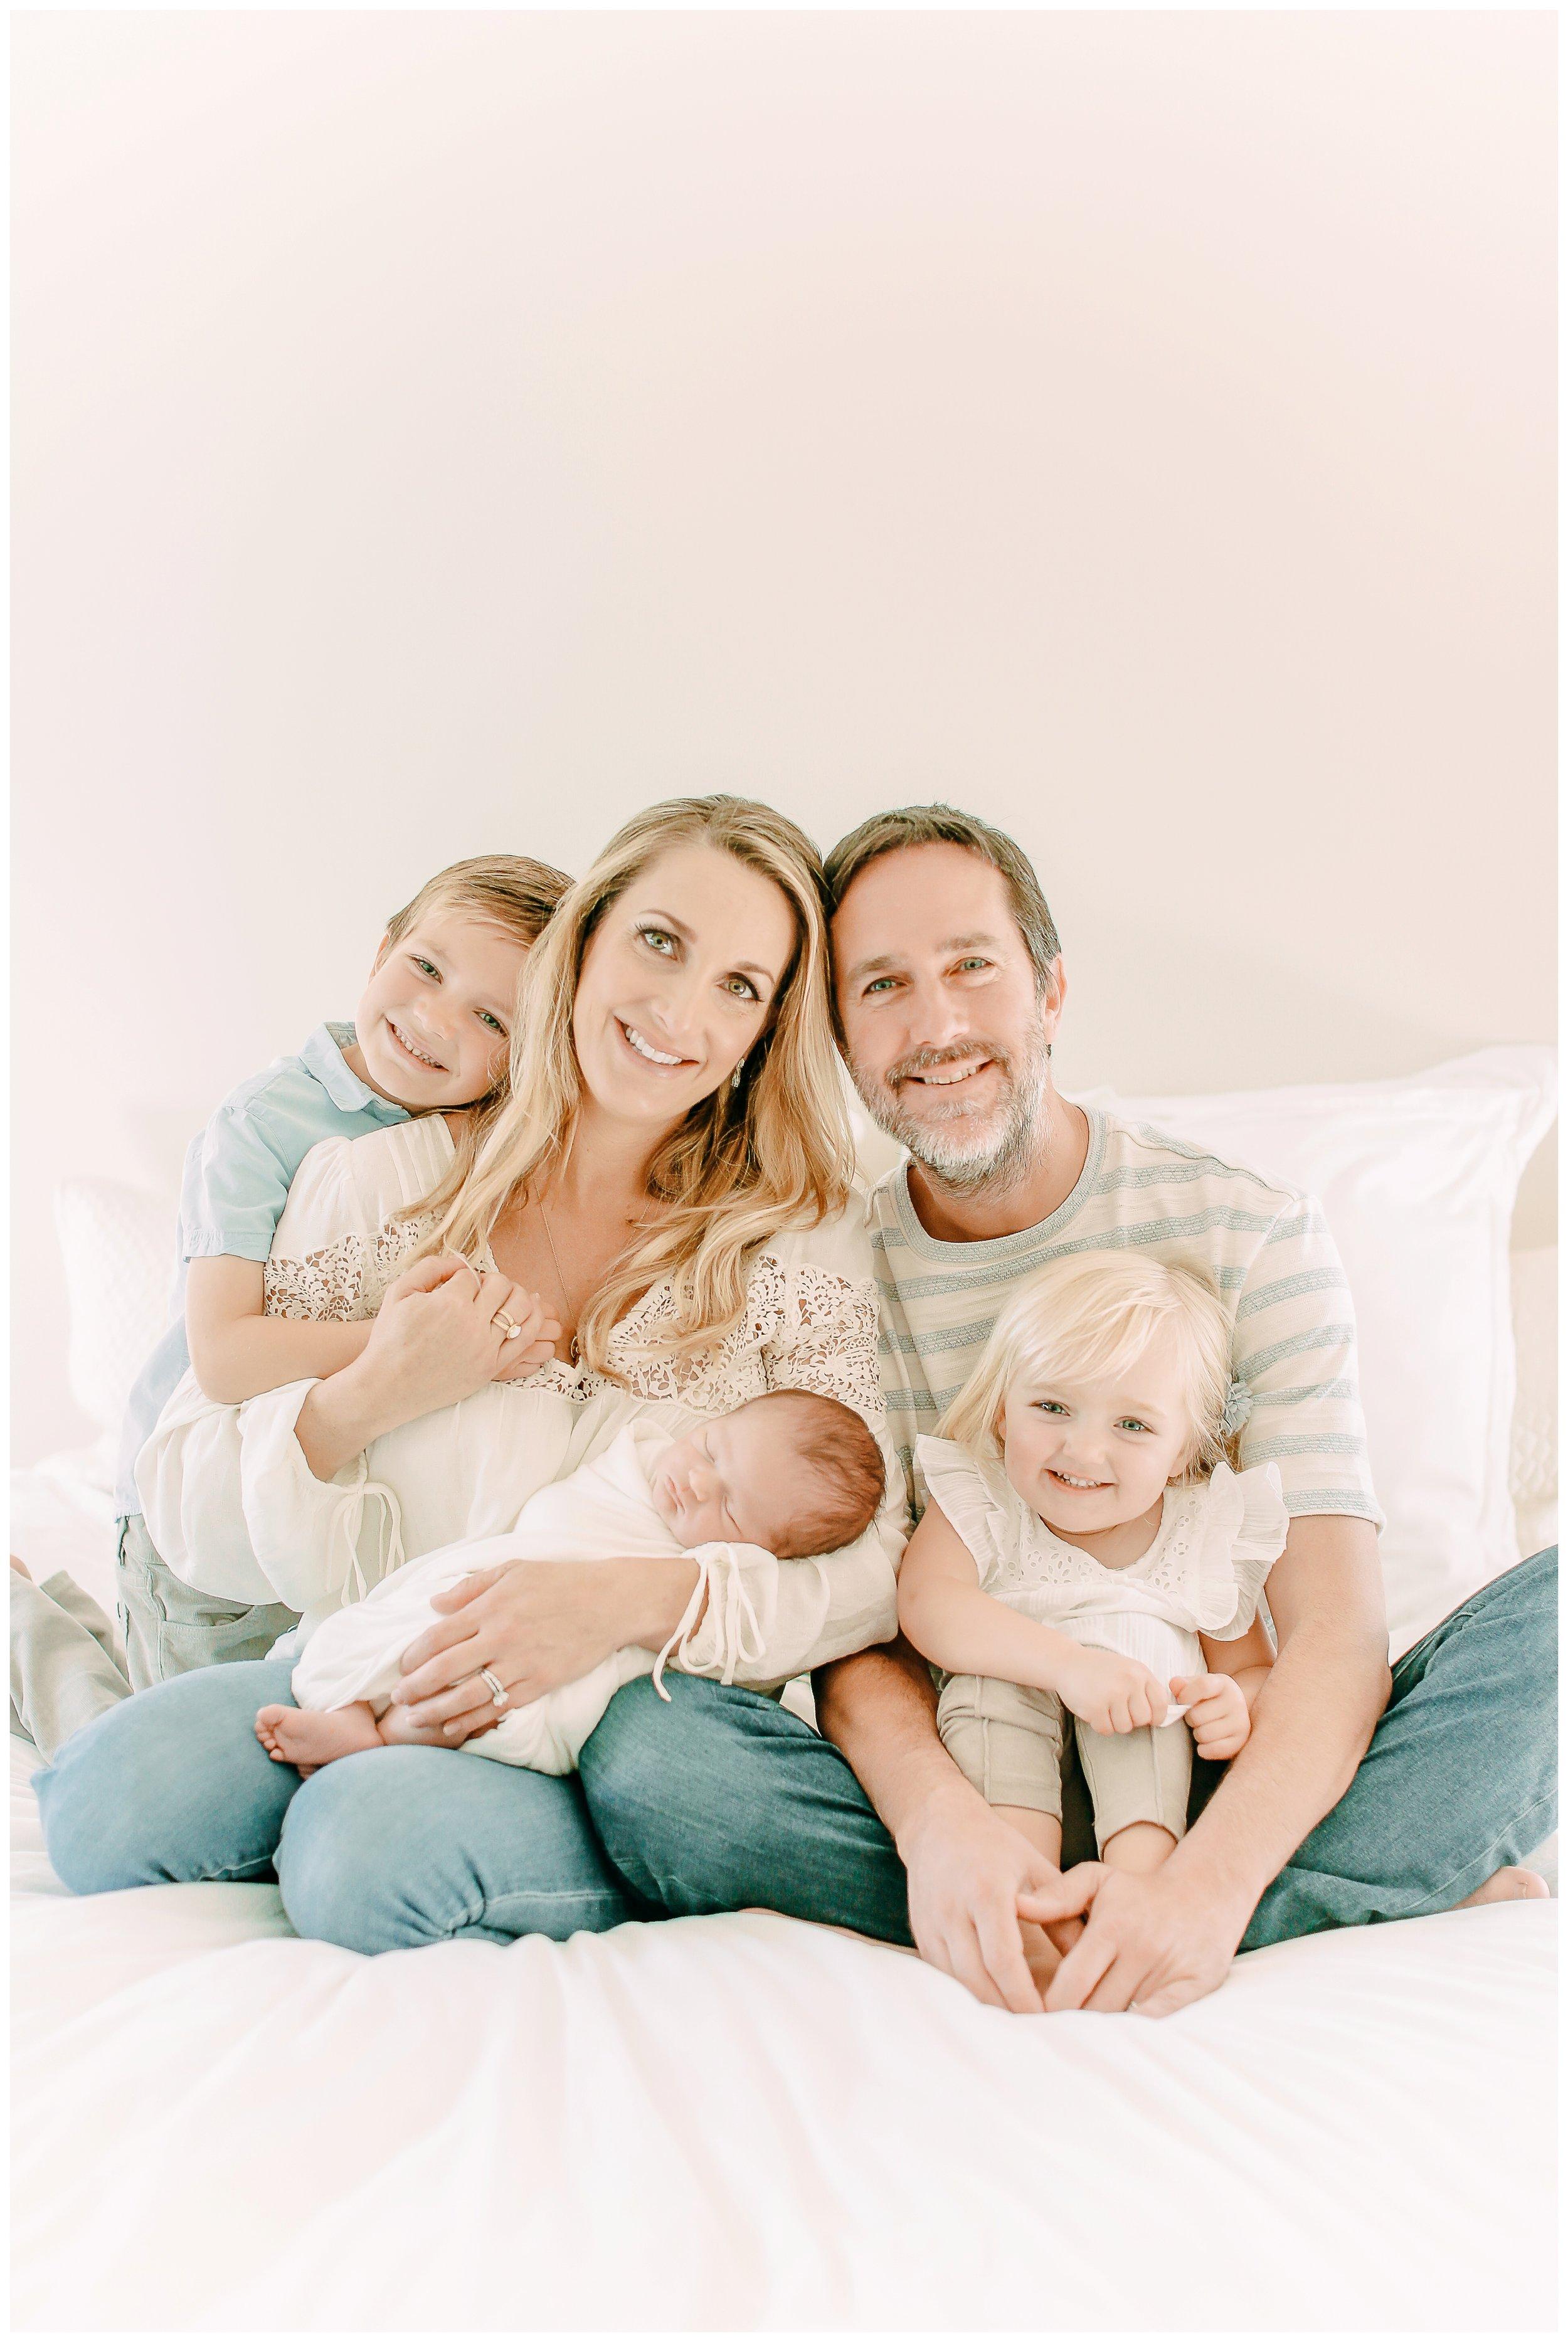 Family-Session_in-home-Orange_county_family_and_newborn-photographer_cori_kleckner_photography_Newport_beach_family_photographer__0810.jpg